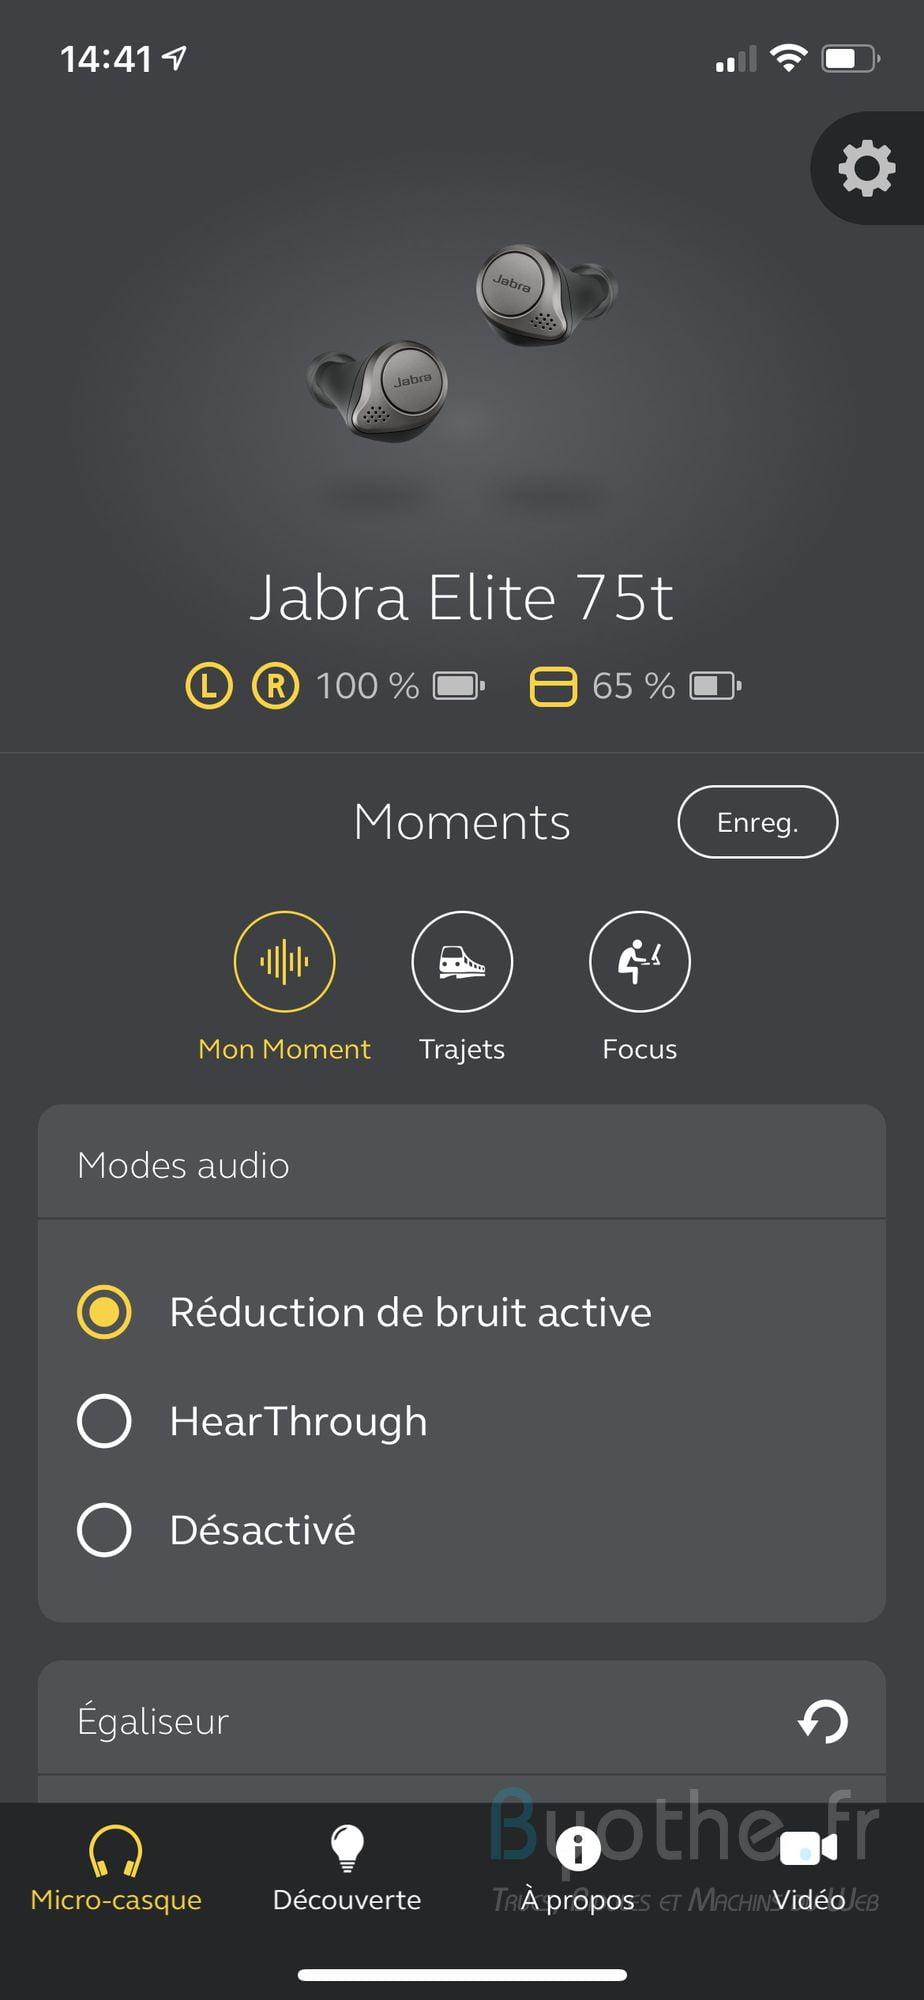 jabra elite 75t application 2